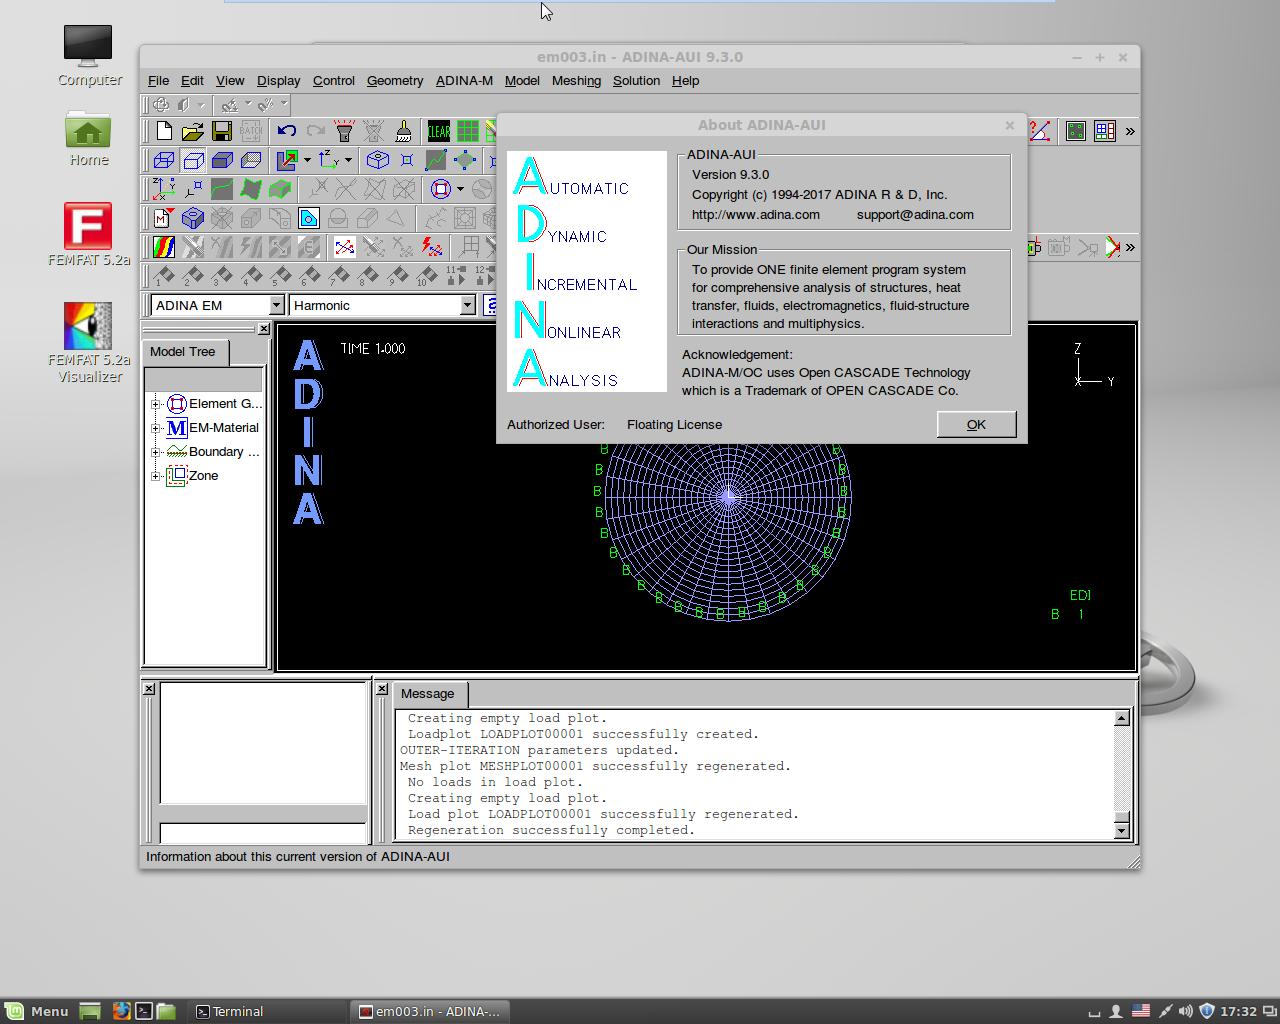 Interface of ADINA System 9.3.0 64bit full license